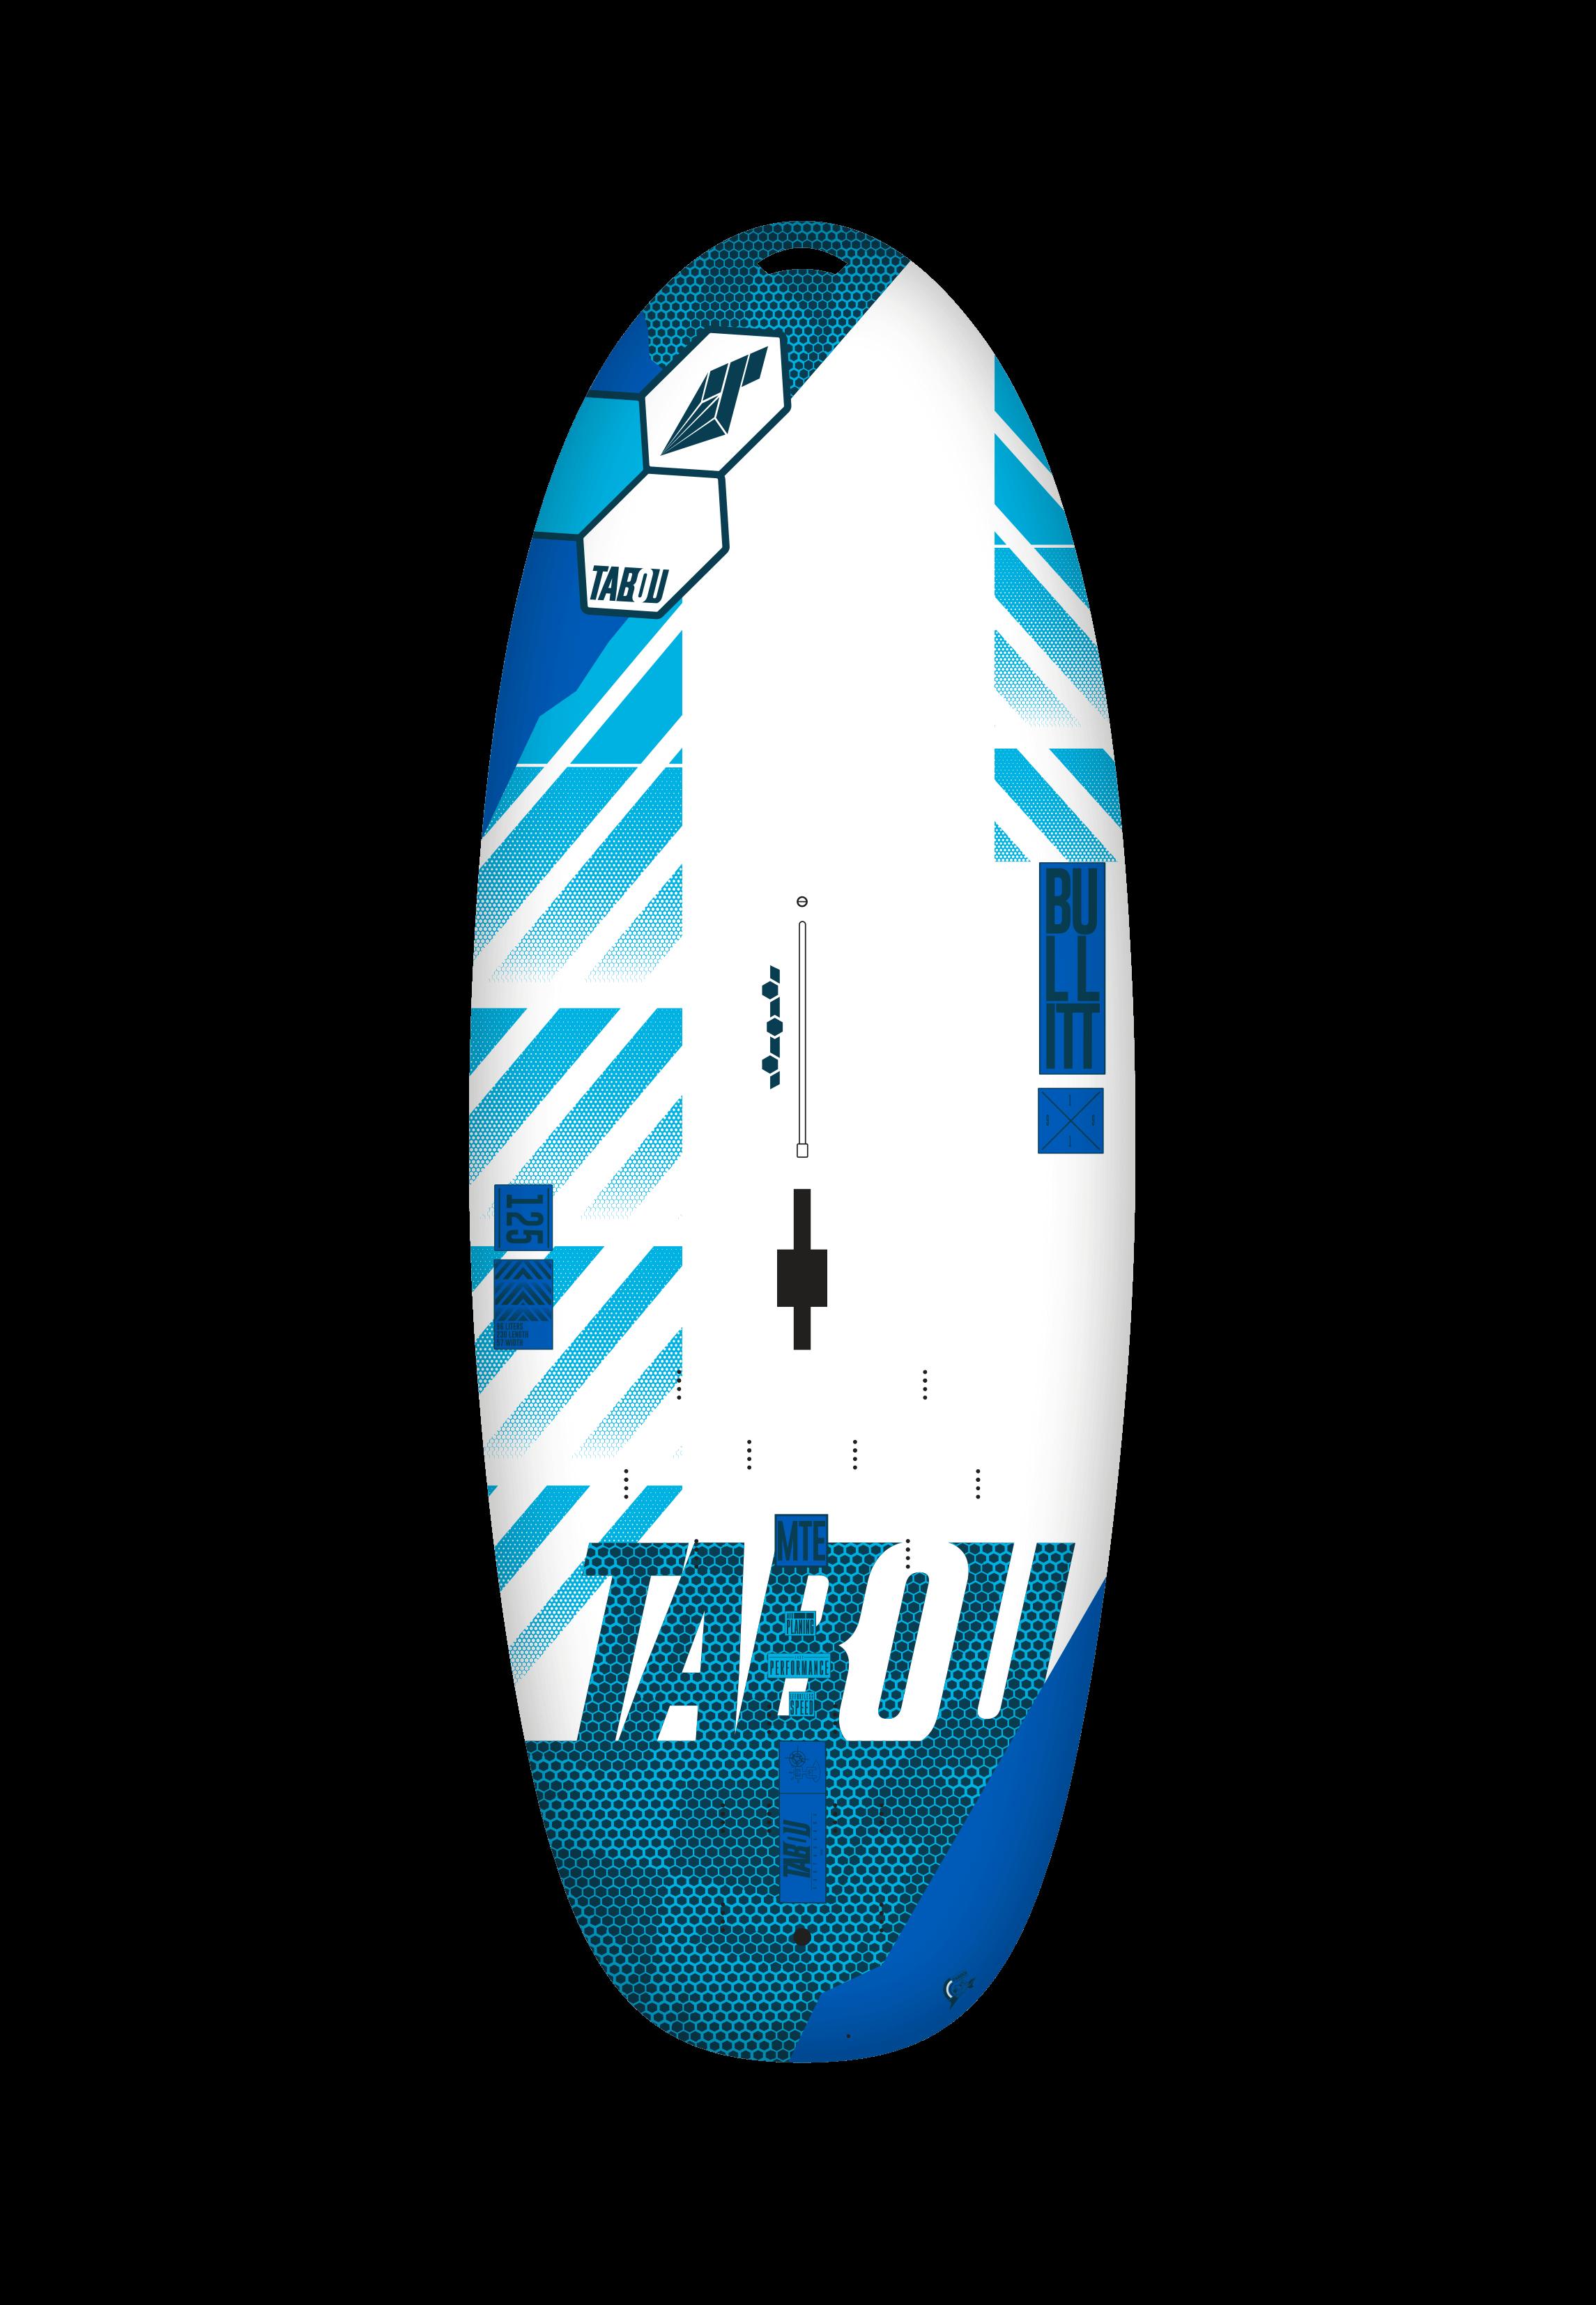 Tabou Bullitt 2021 MTE met midvin